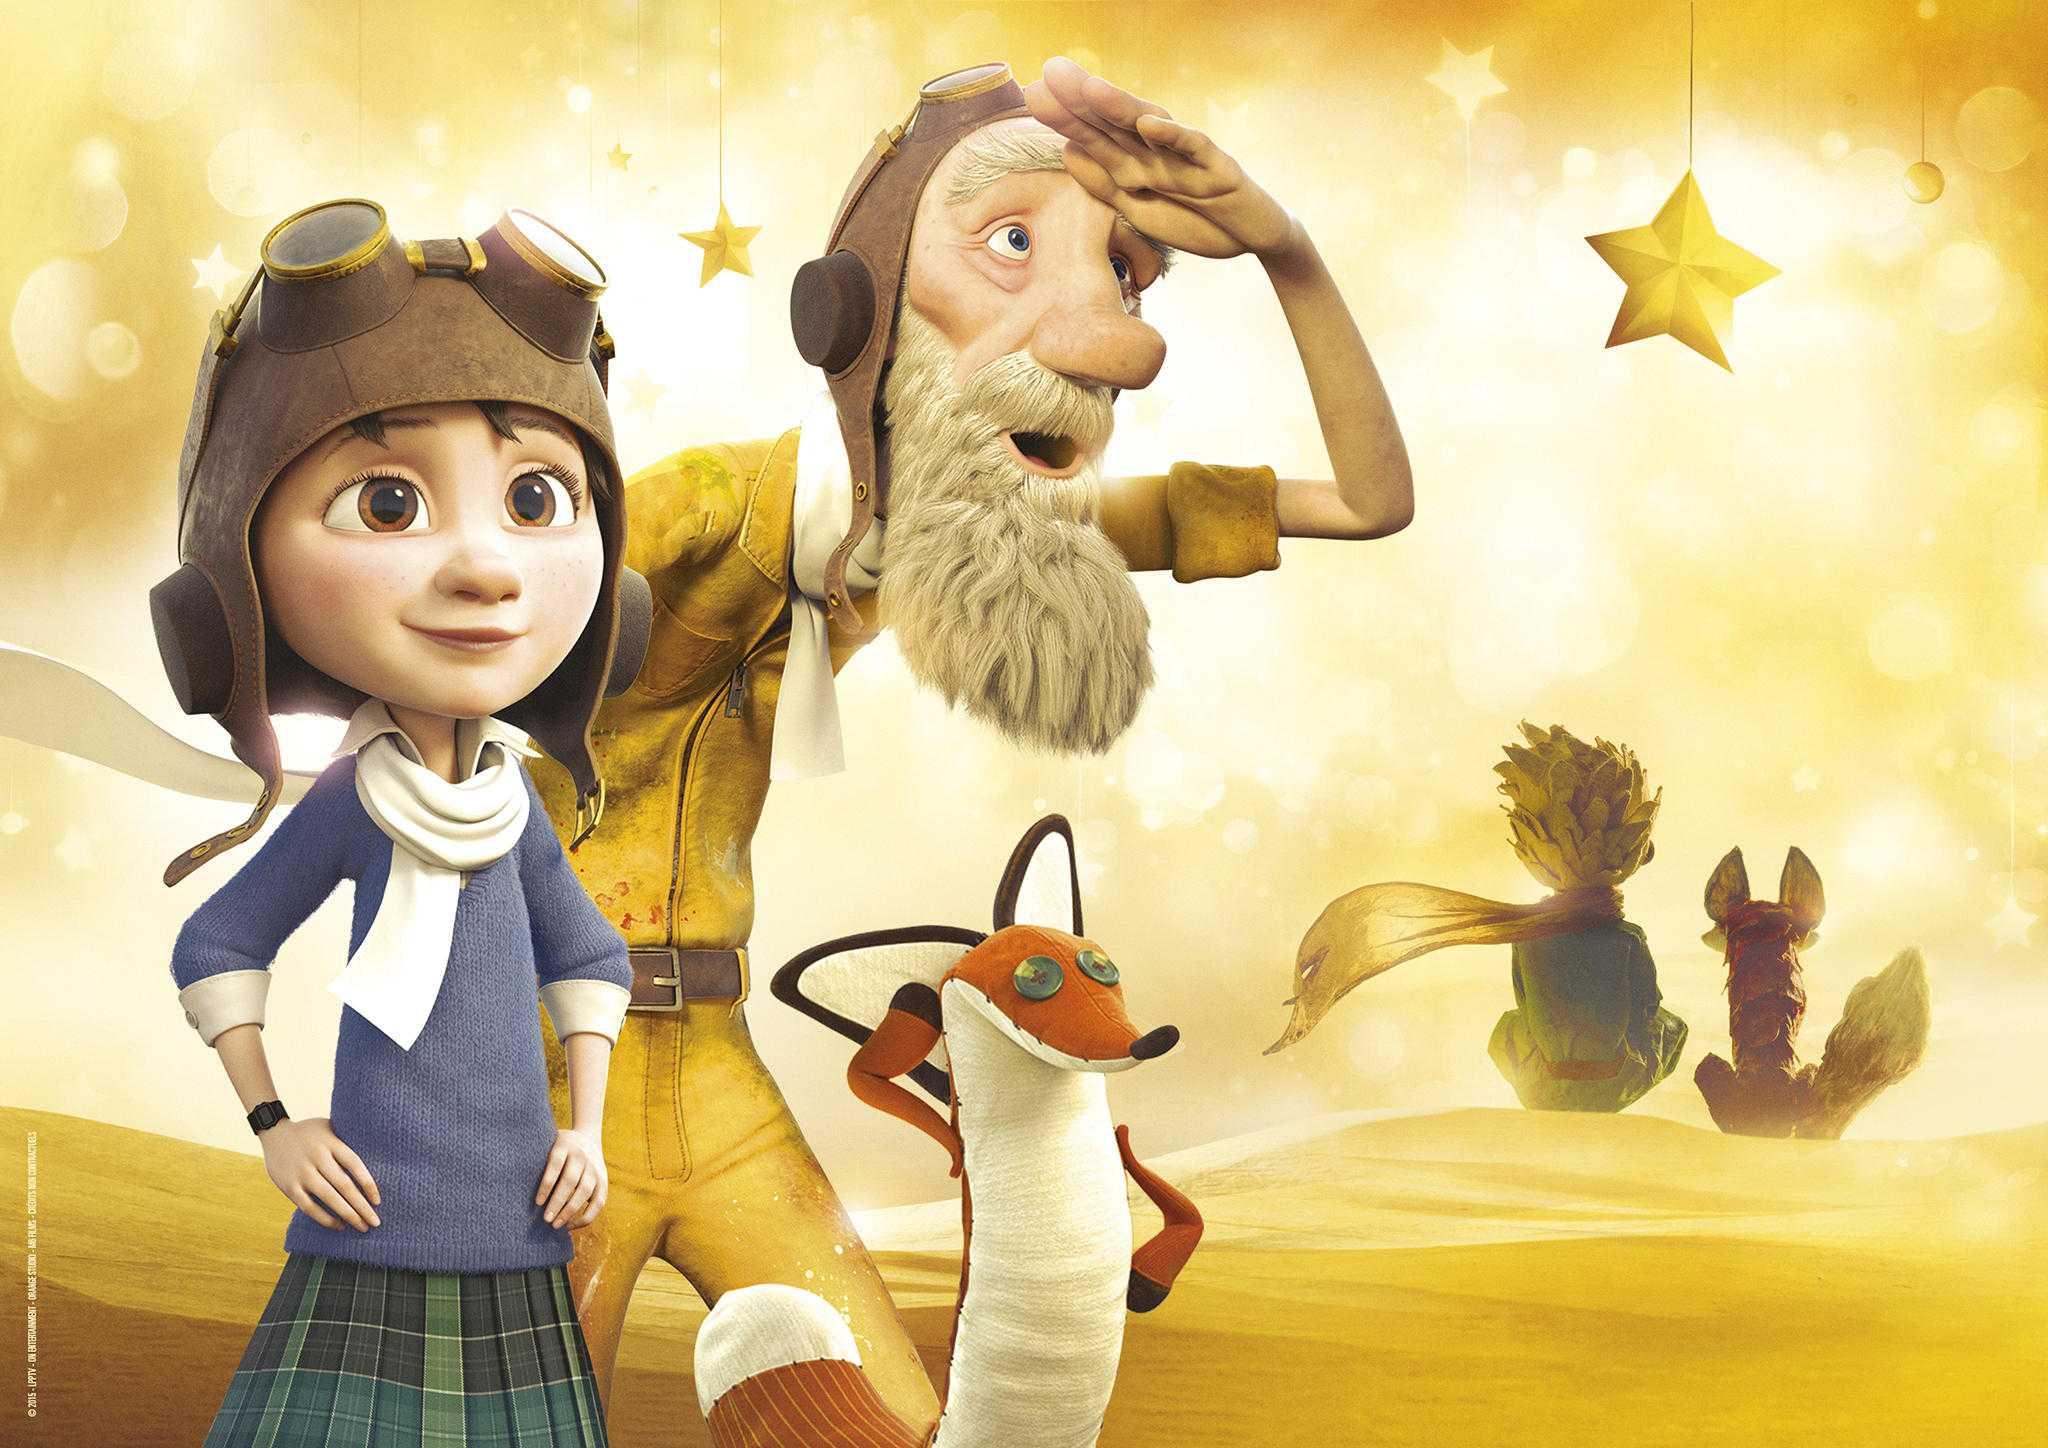 The Little Prince - Ο Μικρός Πρίγκιπας